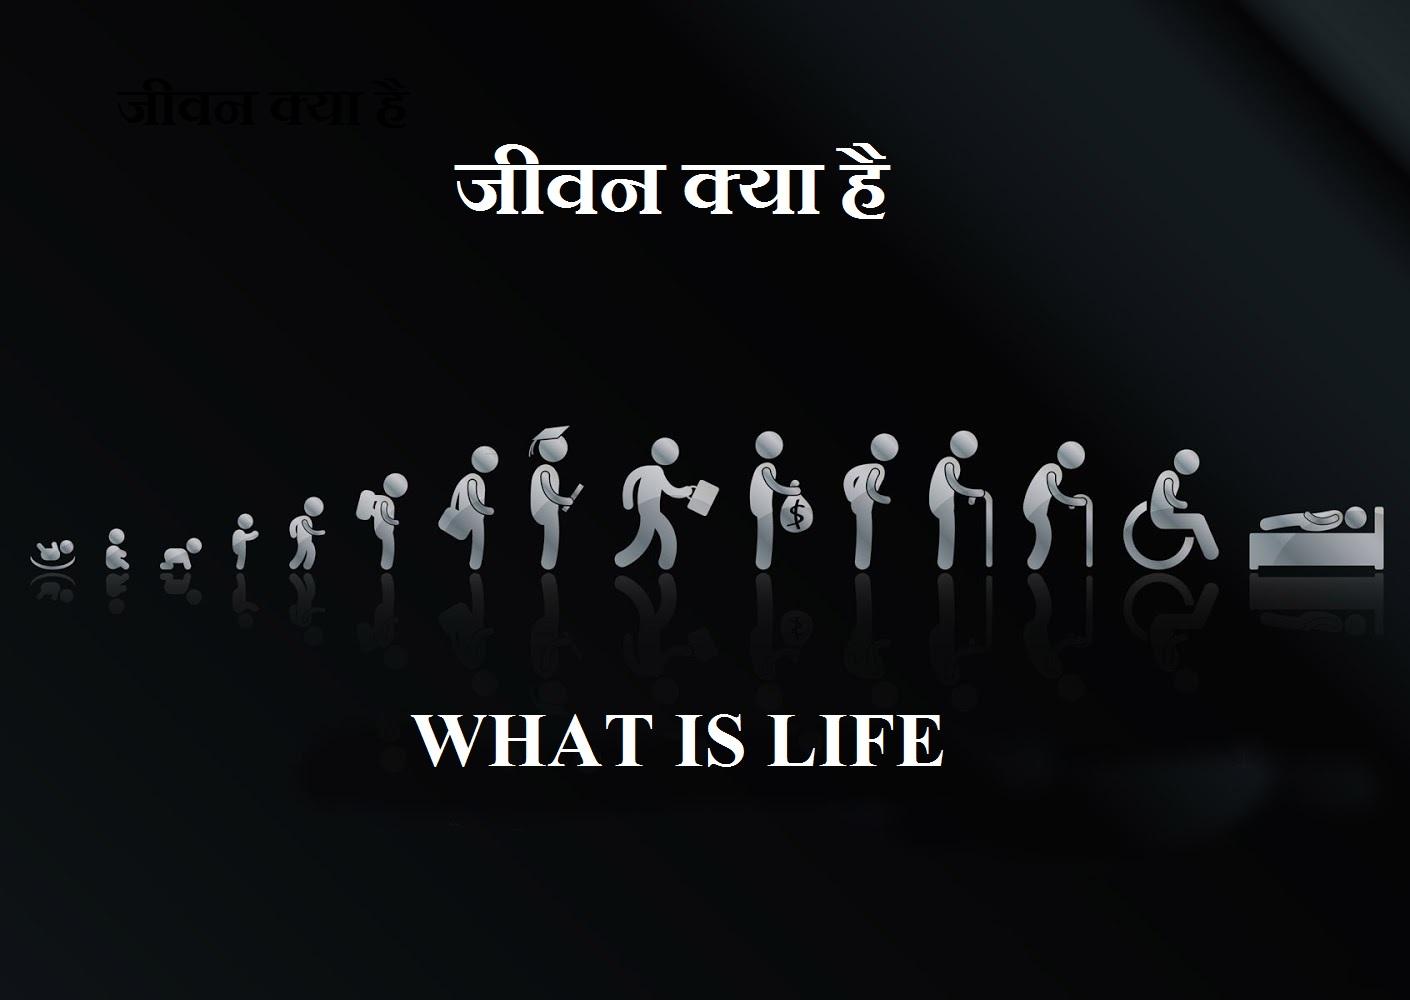 जीवन क्या है, What Is Life Poetry In Hindi, jindagi kya hai, jeevan kya hai, what is life poem in hindi, hindi kavita, raj kumar yadav, nayichetana.com